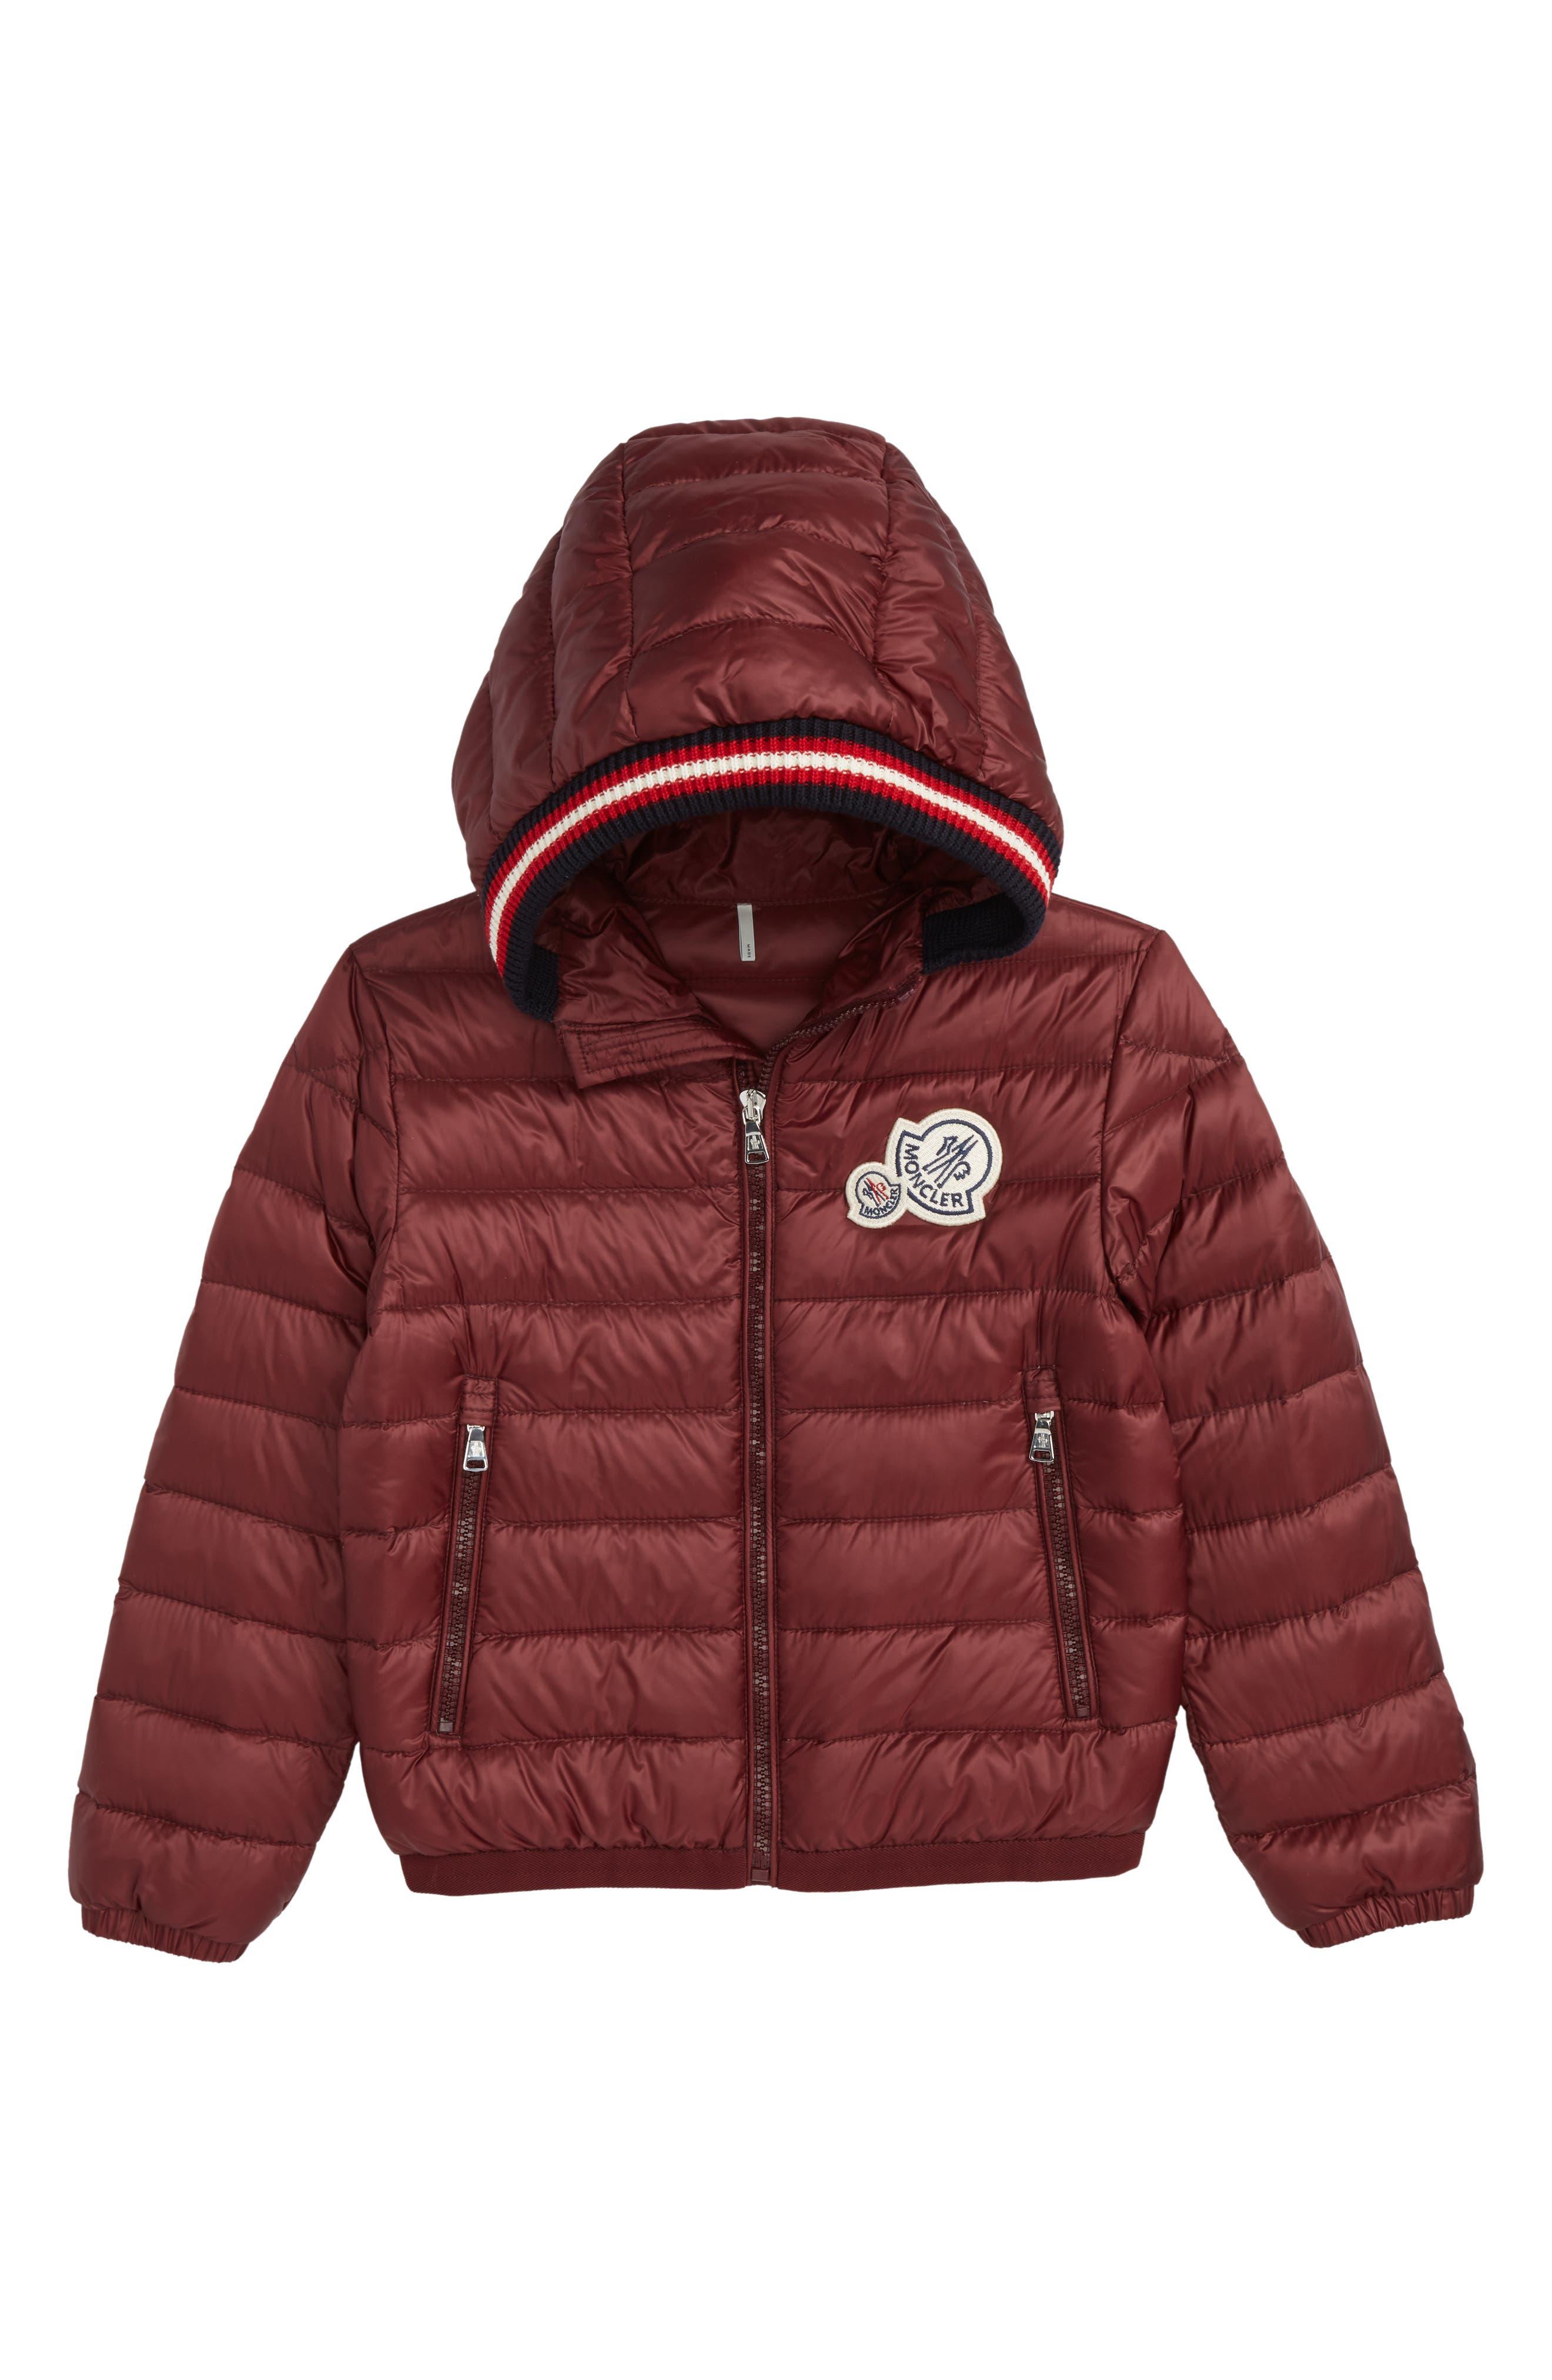 Xavier Long Season Hooded Down Jacket,                         Main,                         color, 930